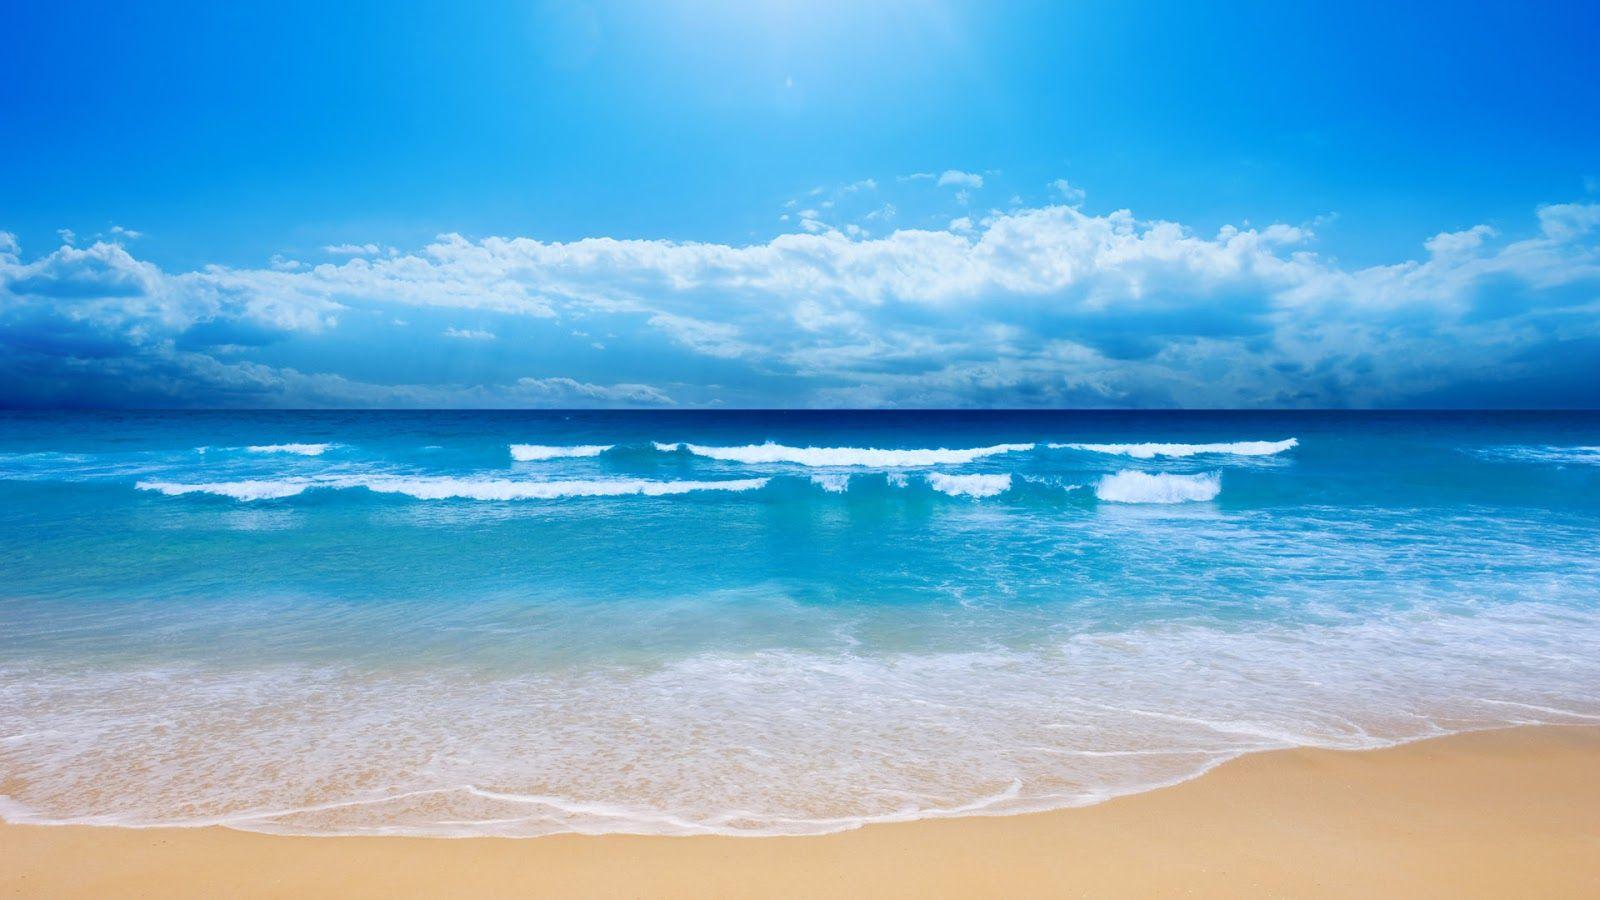 Image Detail For Beach Scenes Wallpaper